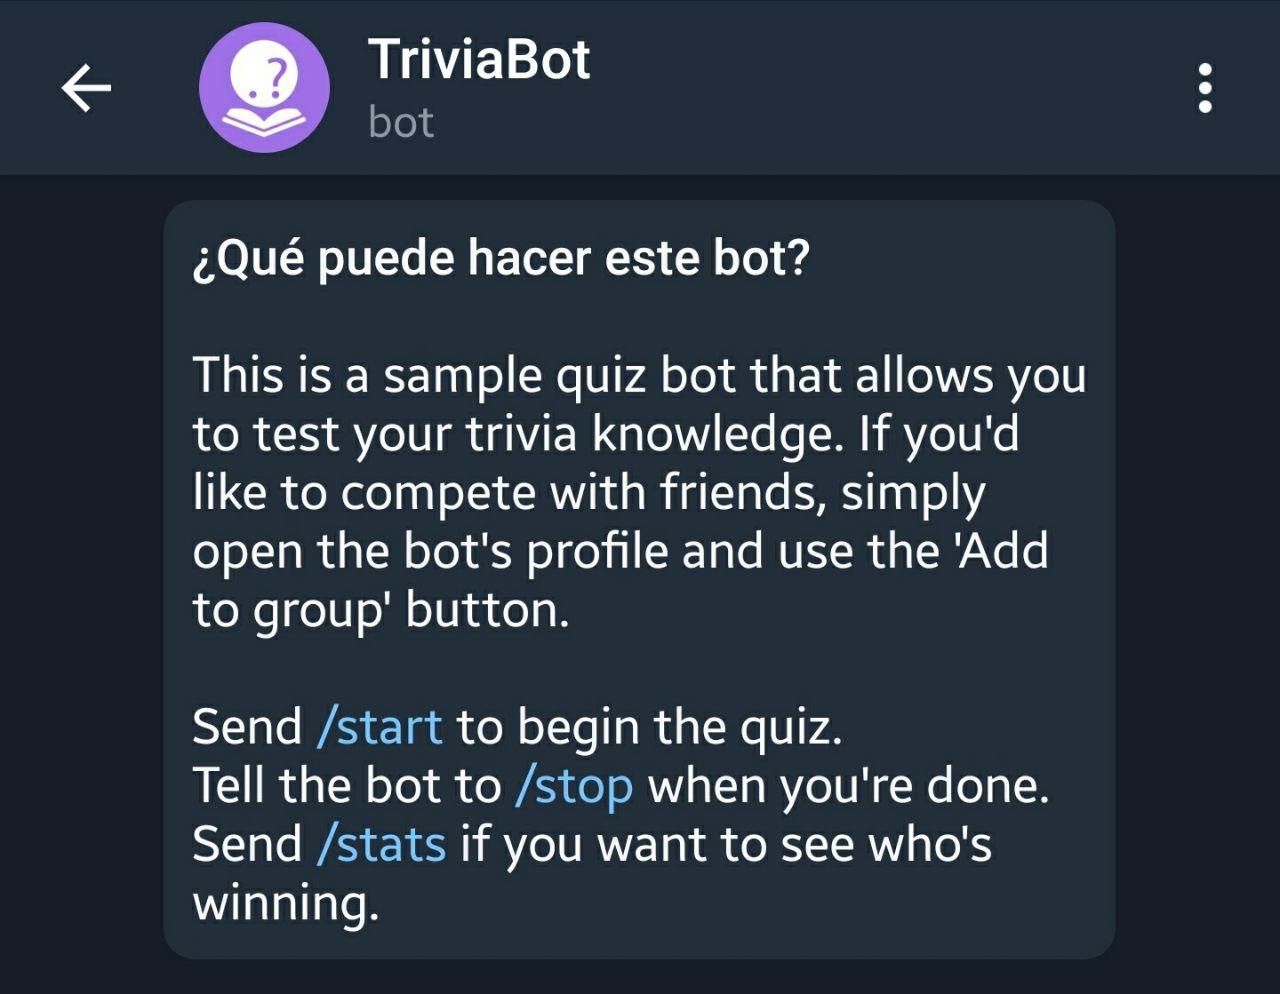 TriviaBot